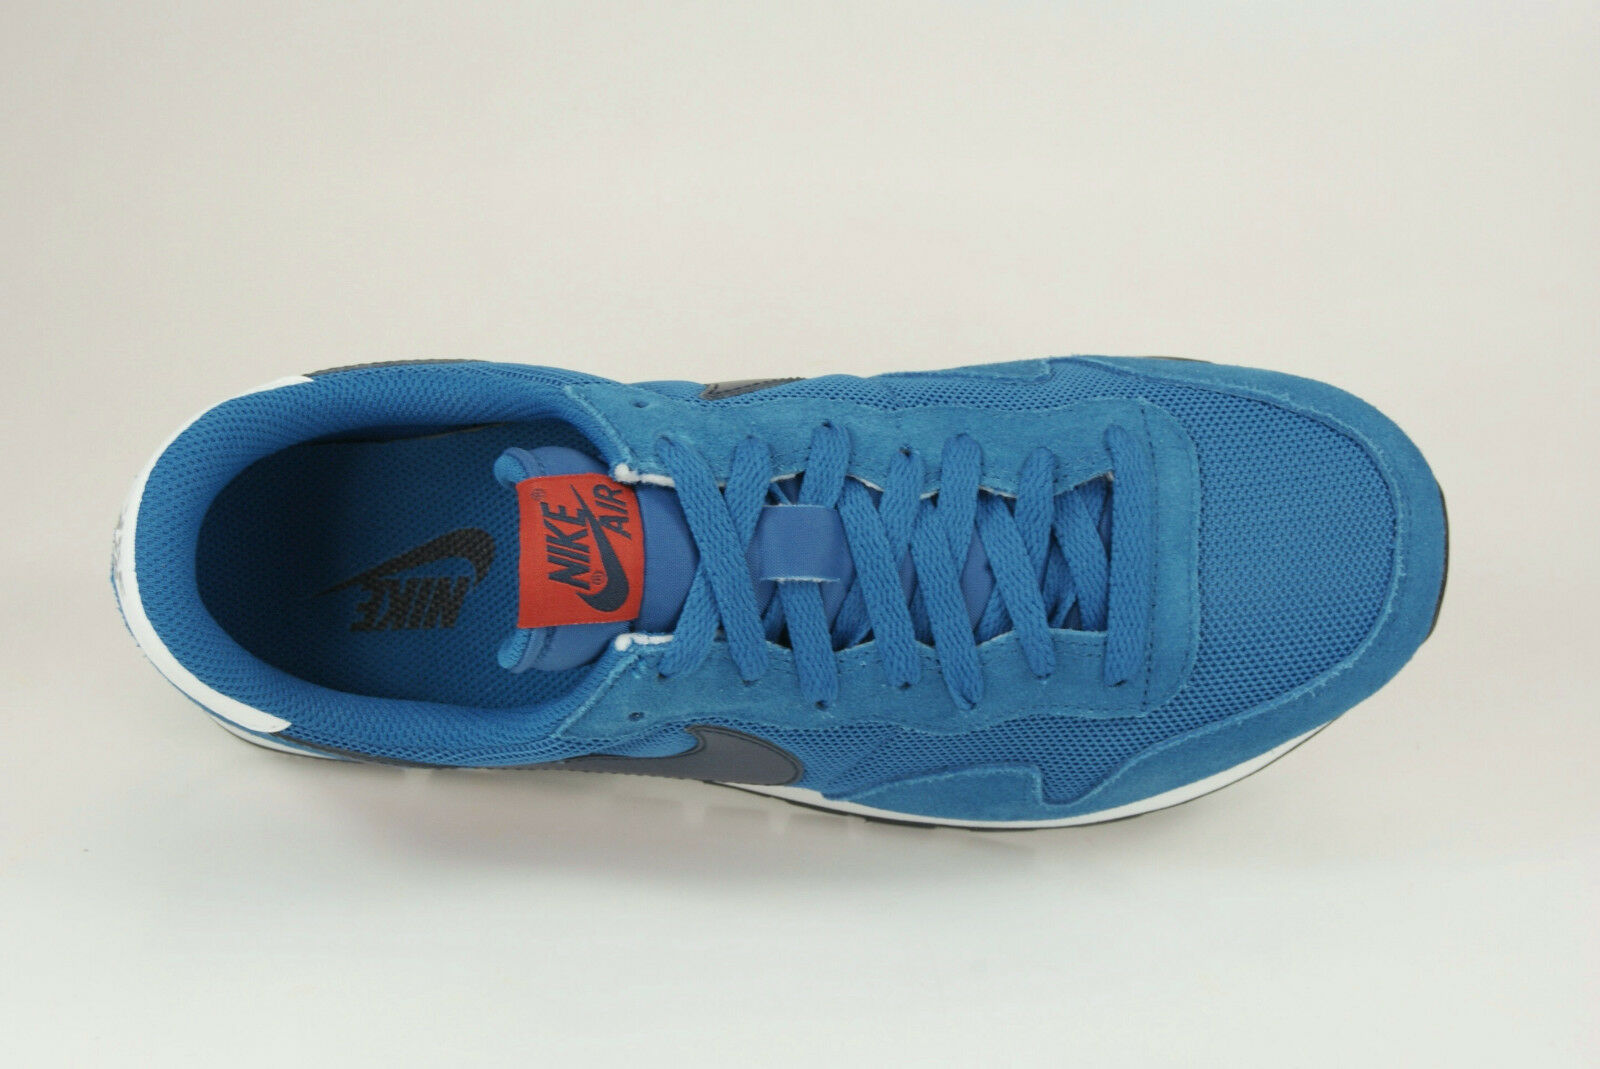 Nike Air Pegasus Pegasus Pegasus 83 Laufschuhe Turnschuhe Sportschuhe Sneakers 599124 400 30d89a